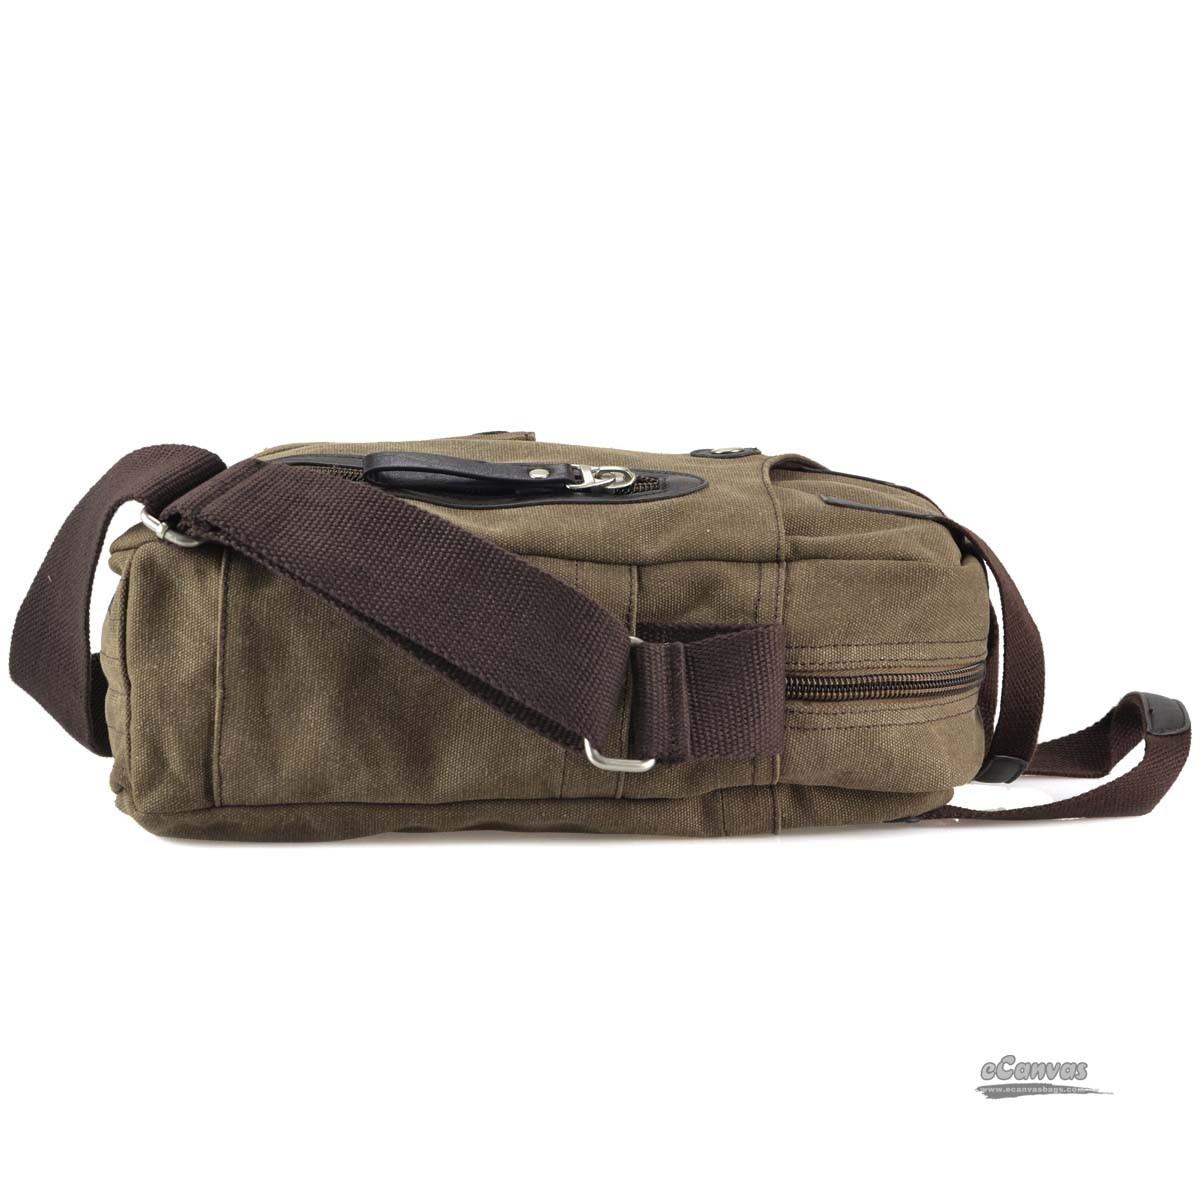 Retro Business Bagcanvas Messenger Bags For Men Khaki Coffee - E-CanvasBags